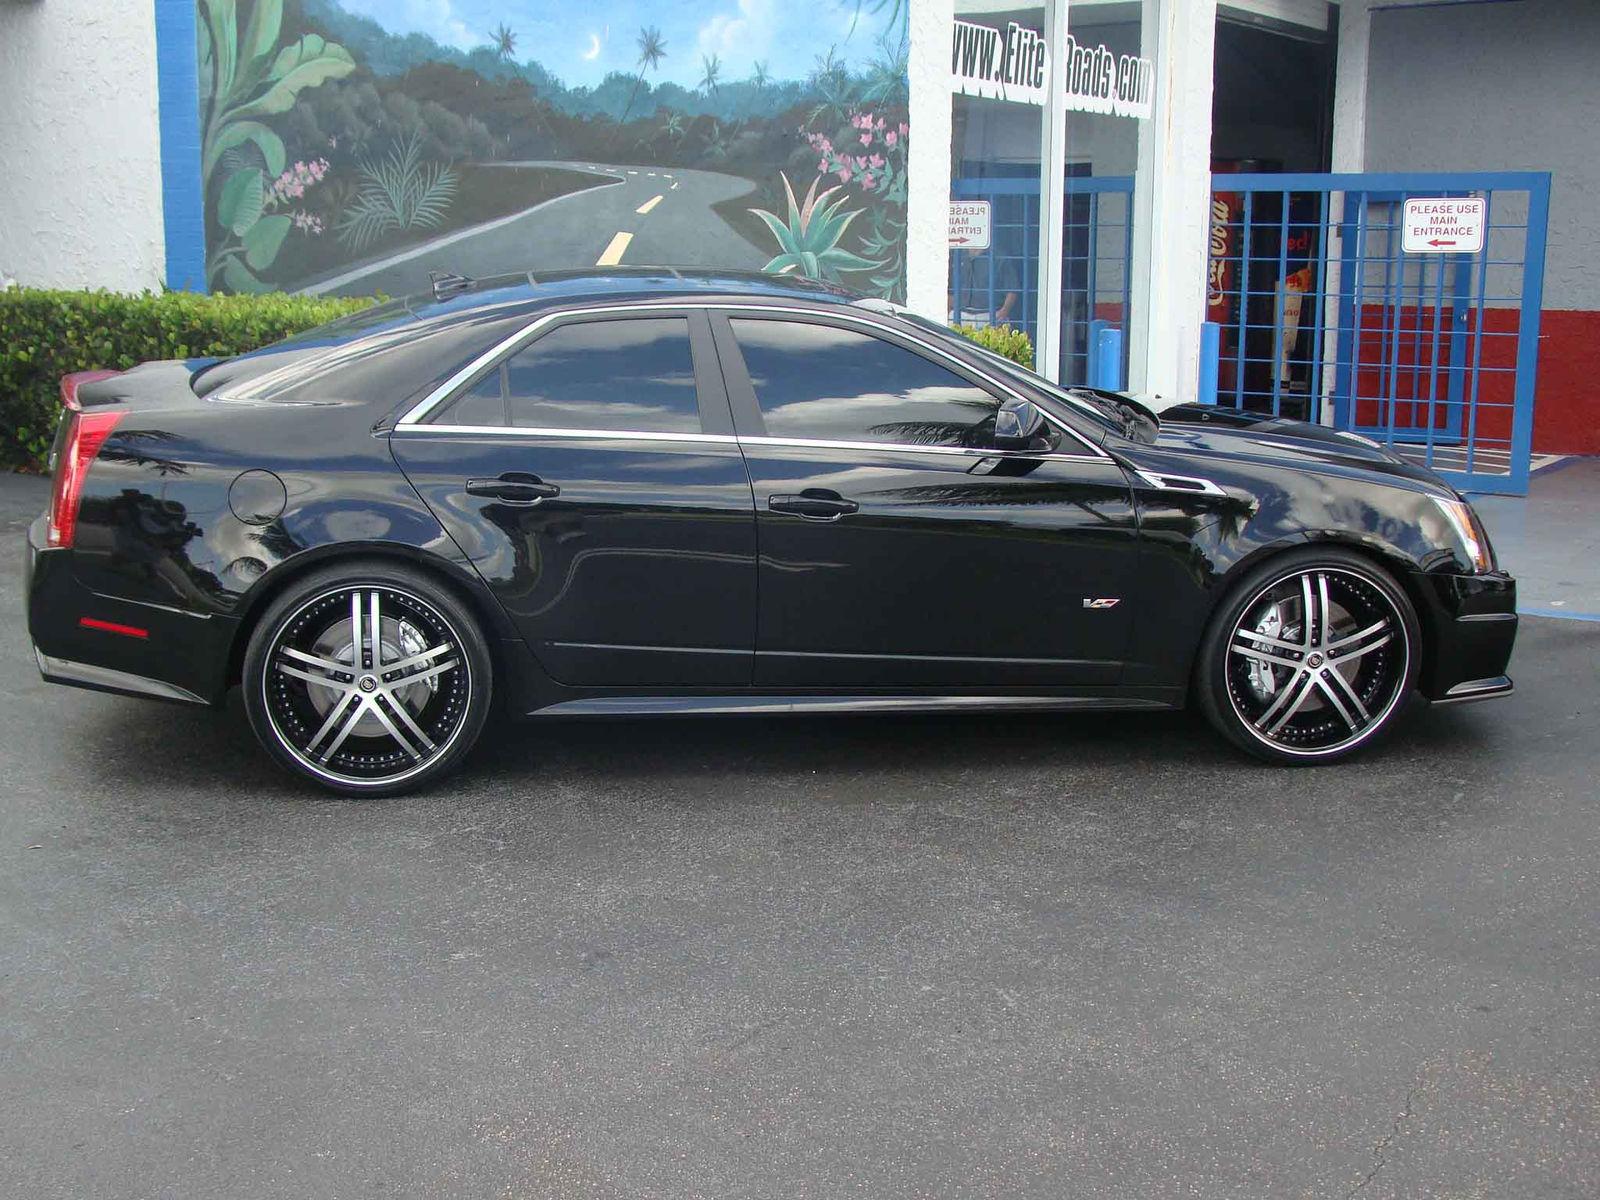 2011 Cadillac CTS-V | Cadillac CTS-V